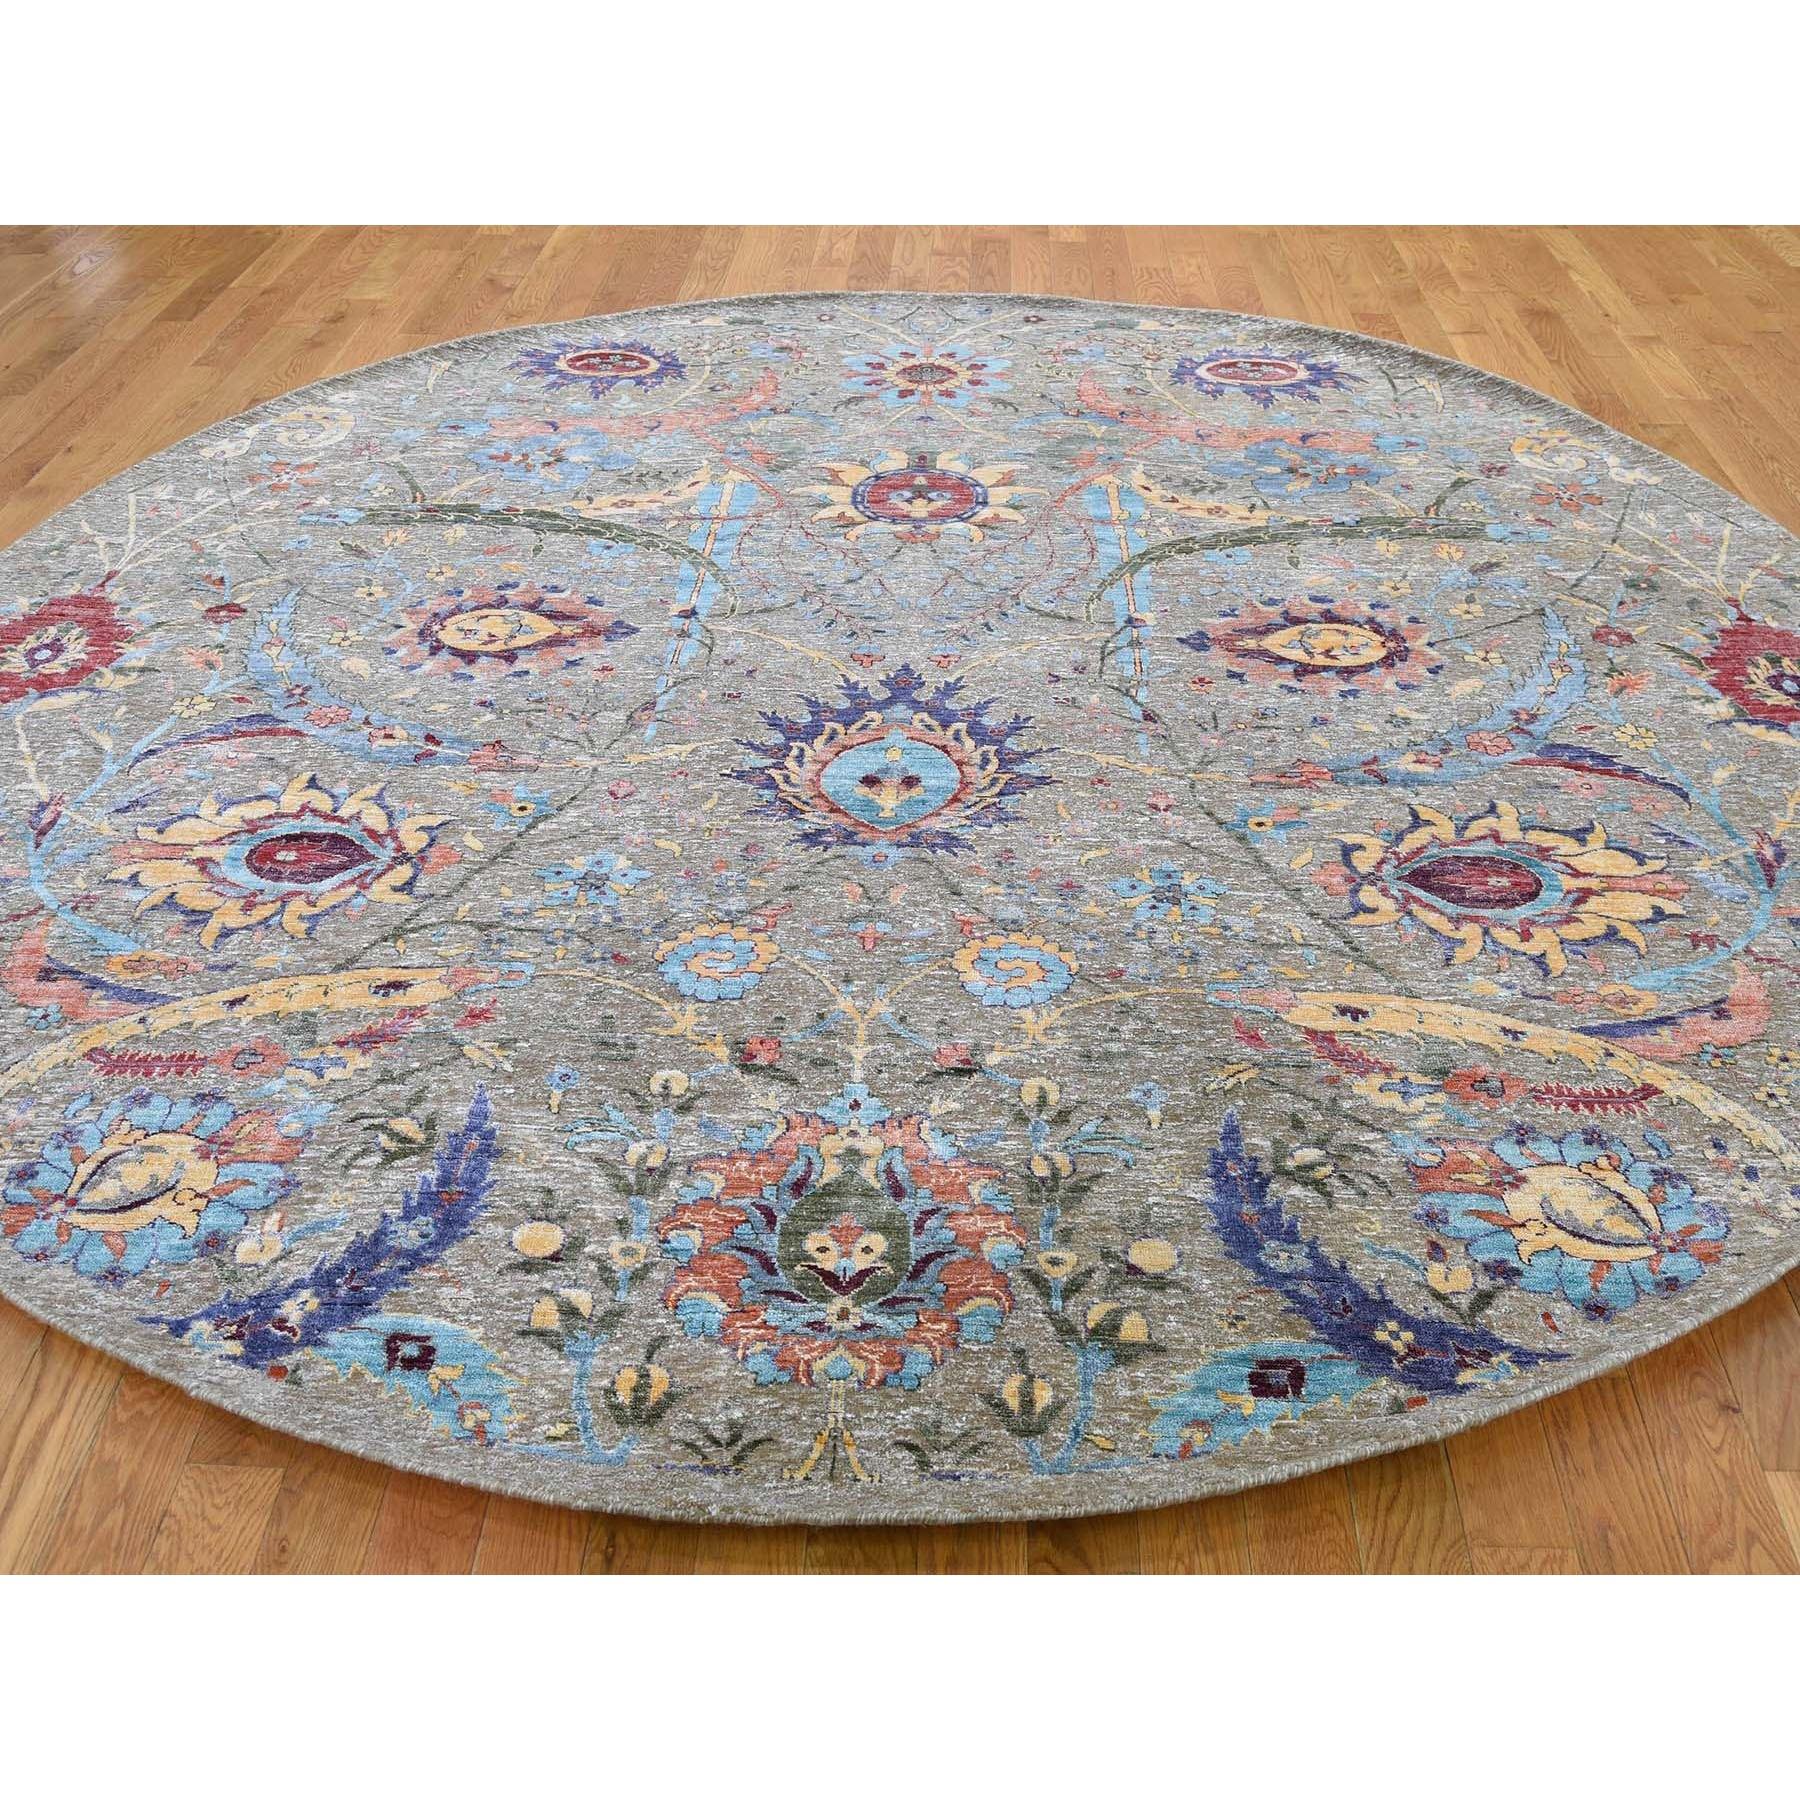 "9'10""x9'10"" Round Sickle Leaf Design Silk With Textured Wool Hand Knotted Oriental Rug"